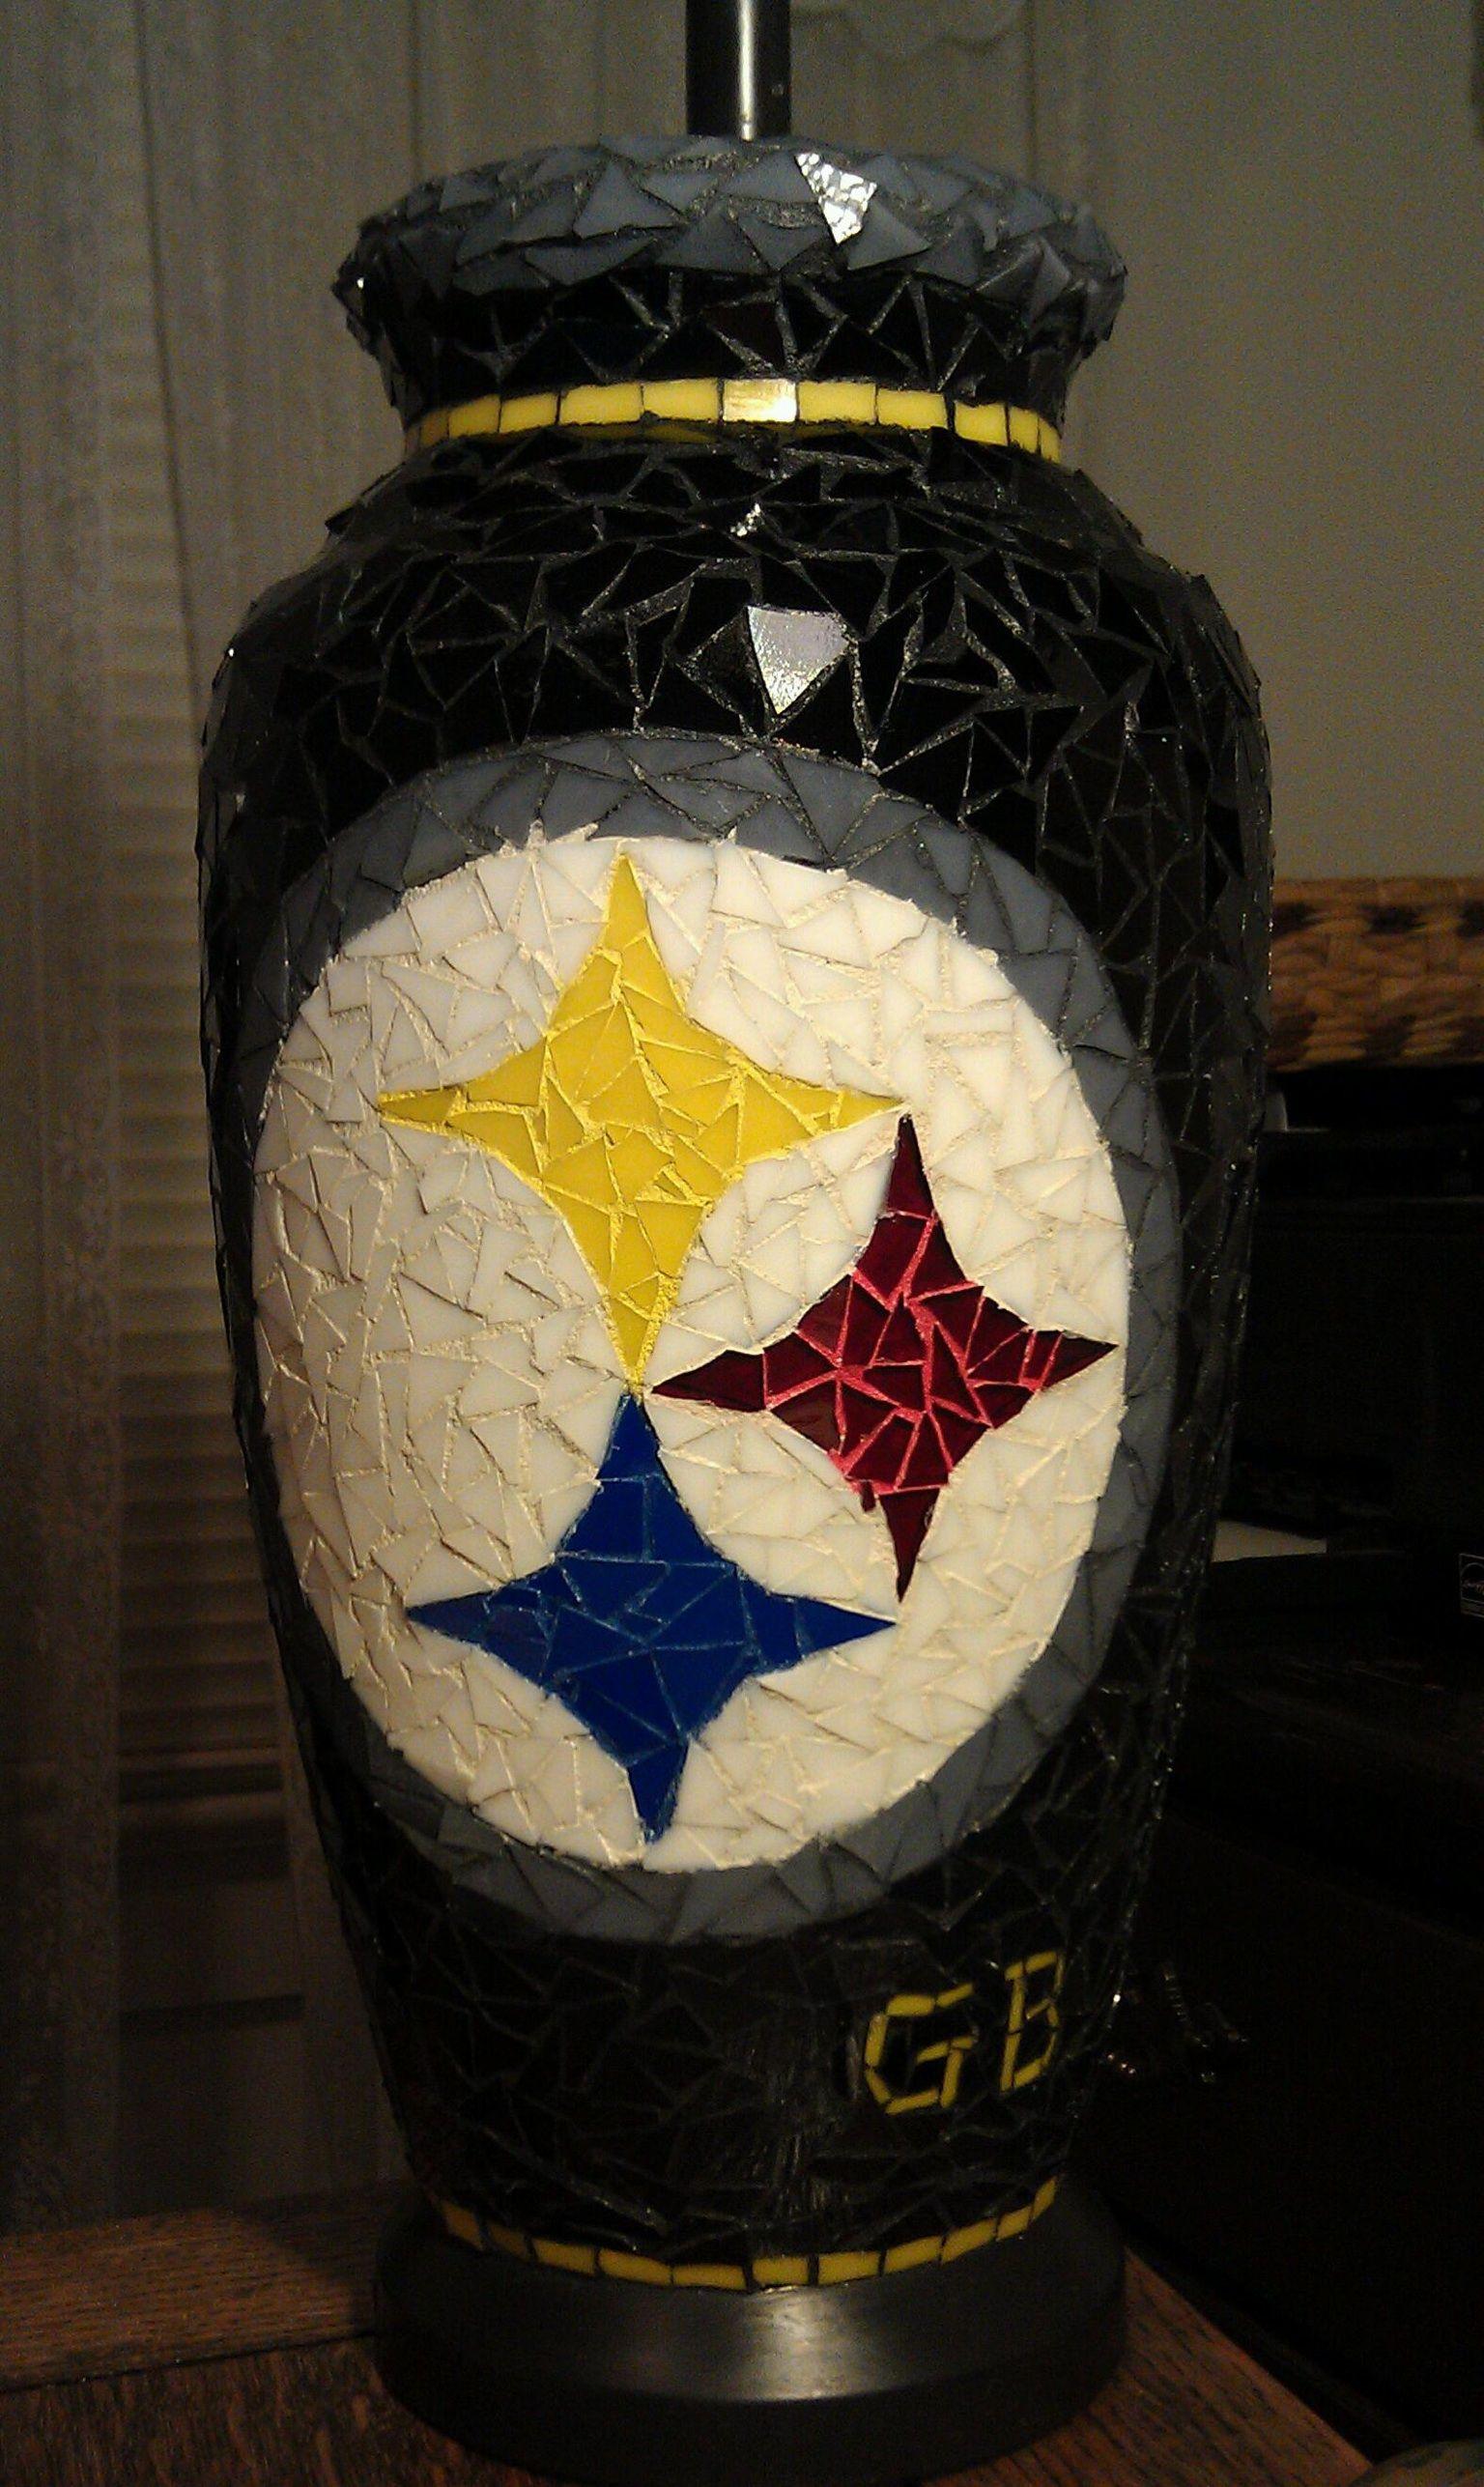 Pittsburgh Steelers Mosaic Steelers Lamp ℬℒaℂk Yℰℒℒow ร